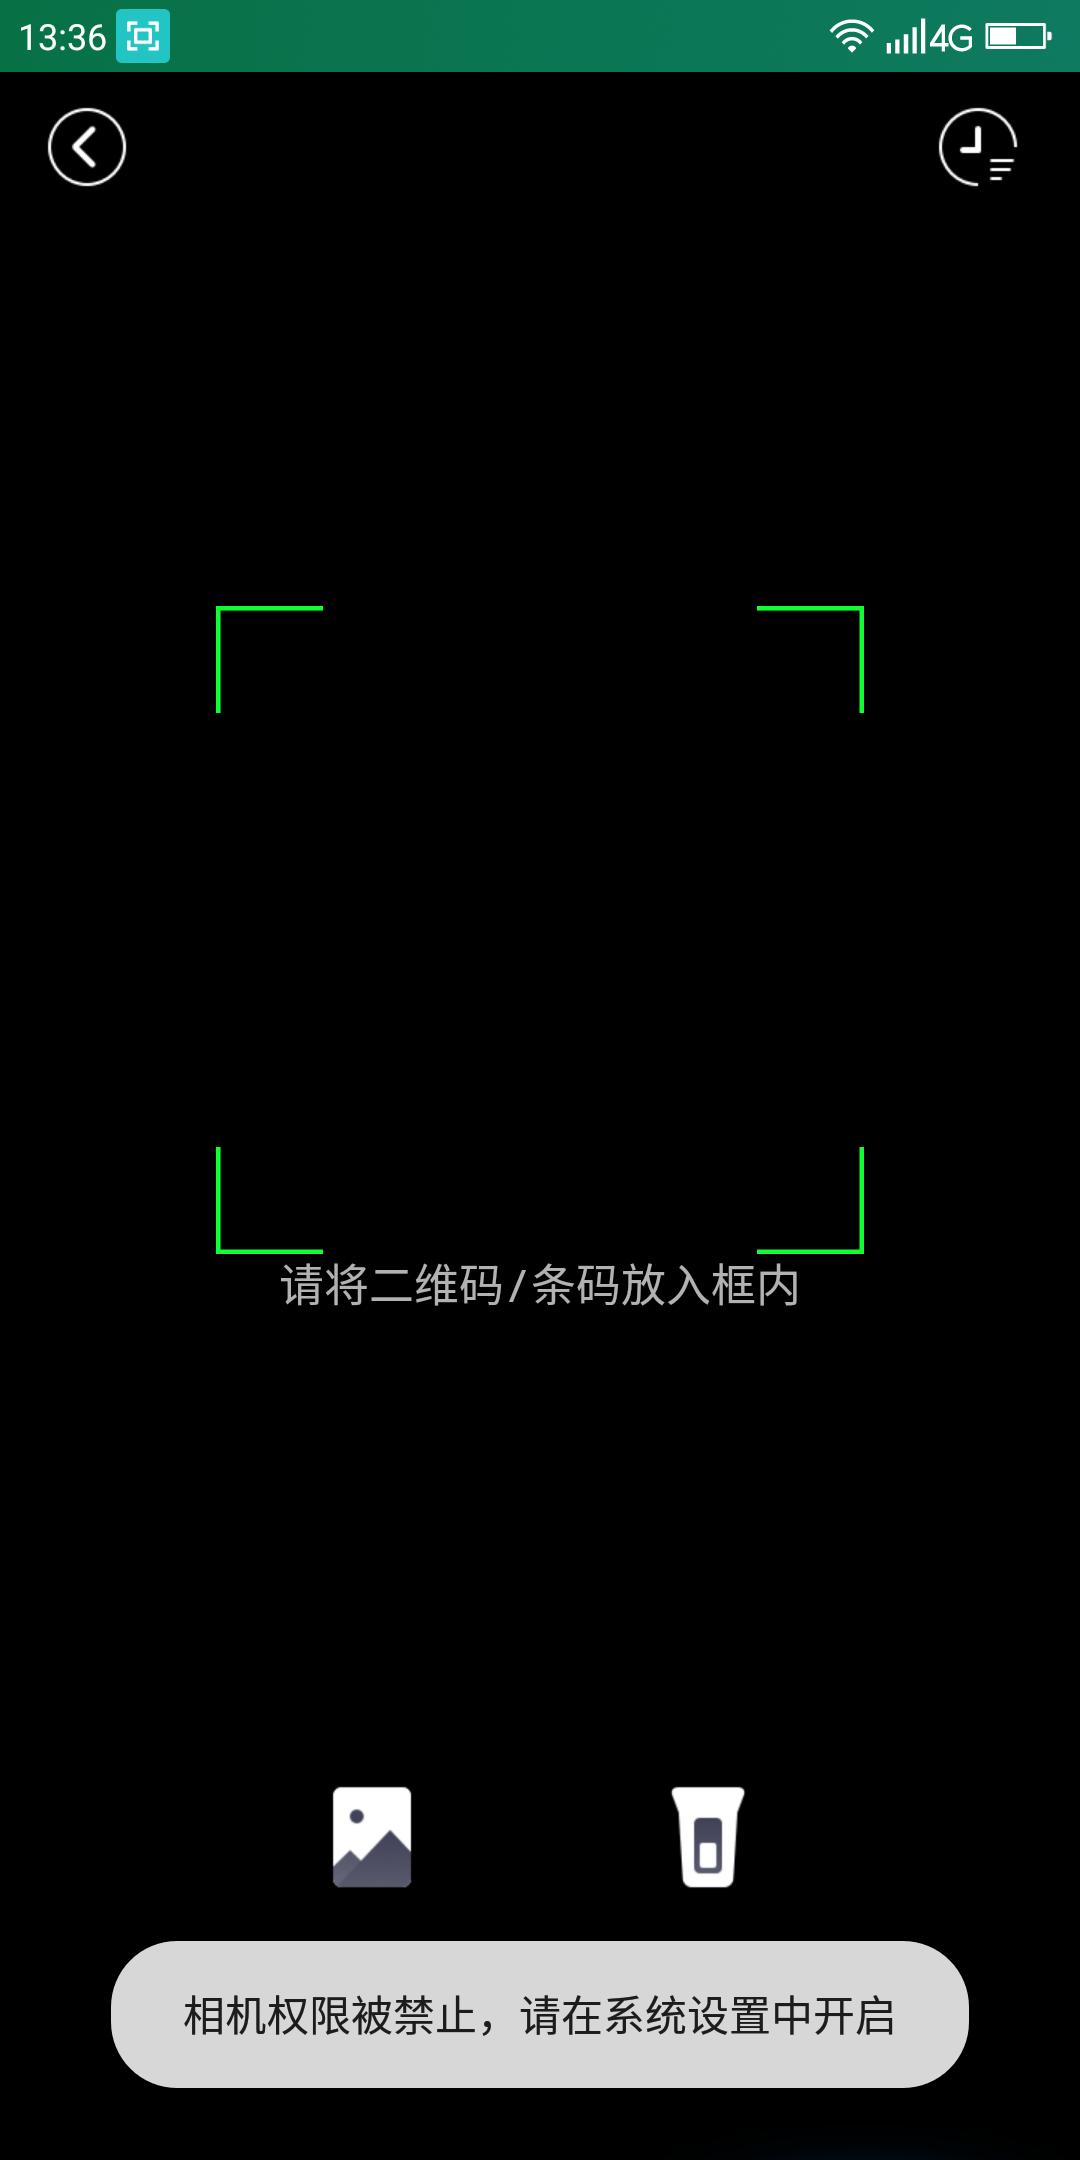 Screenshot_2018-11-02-13-36-27.png